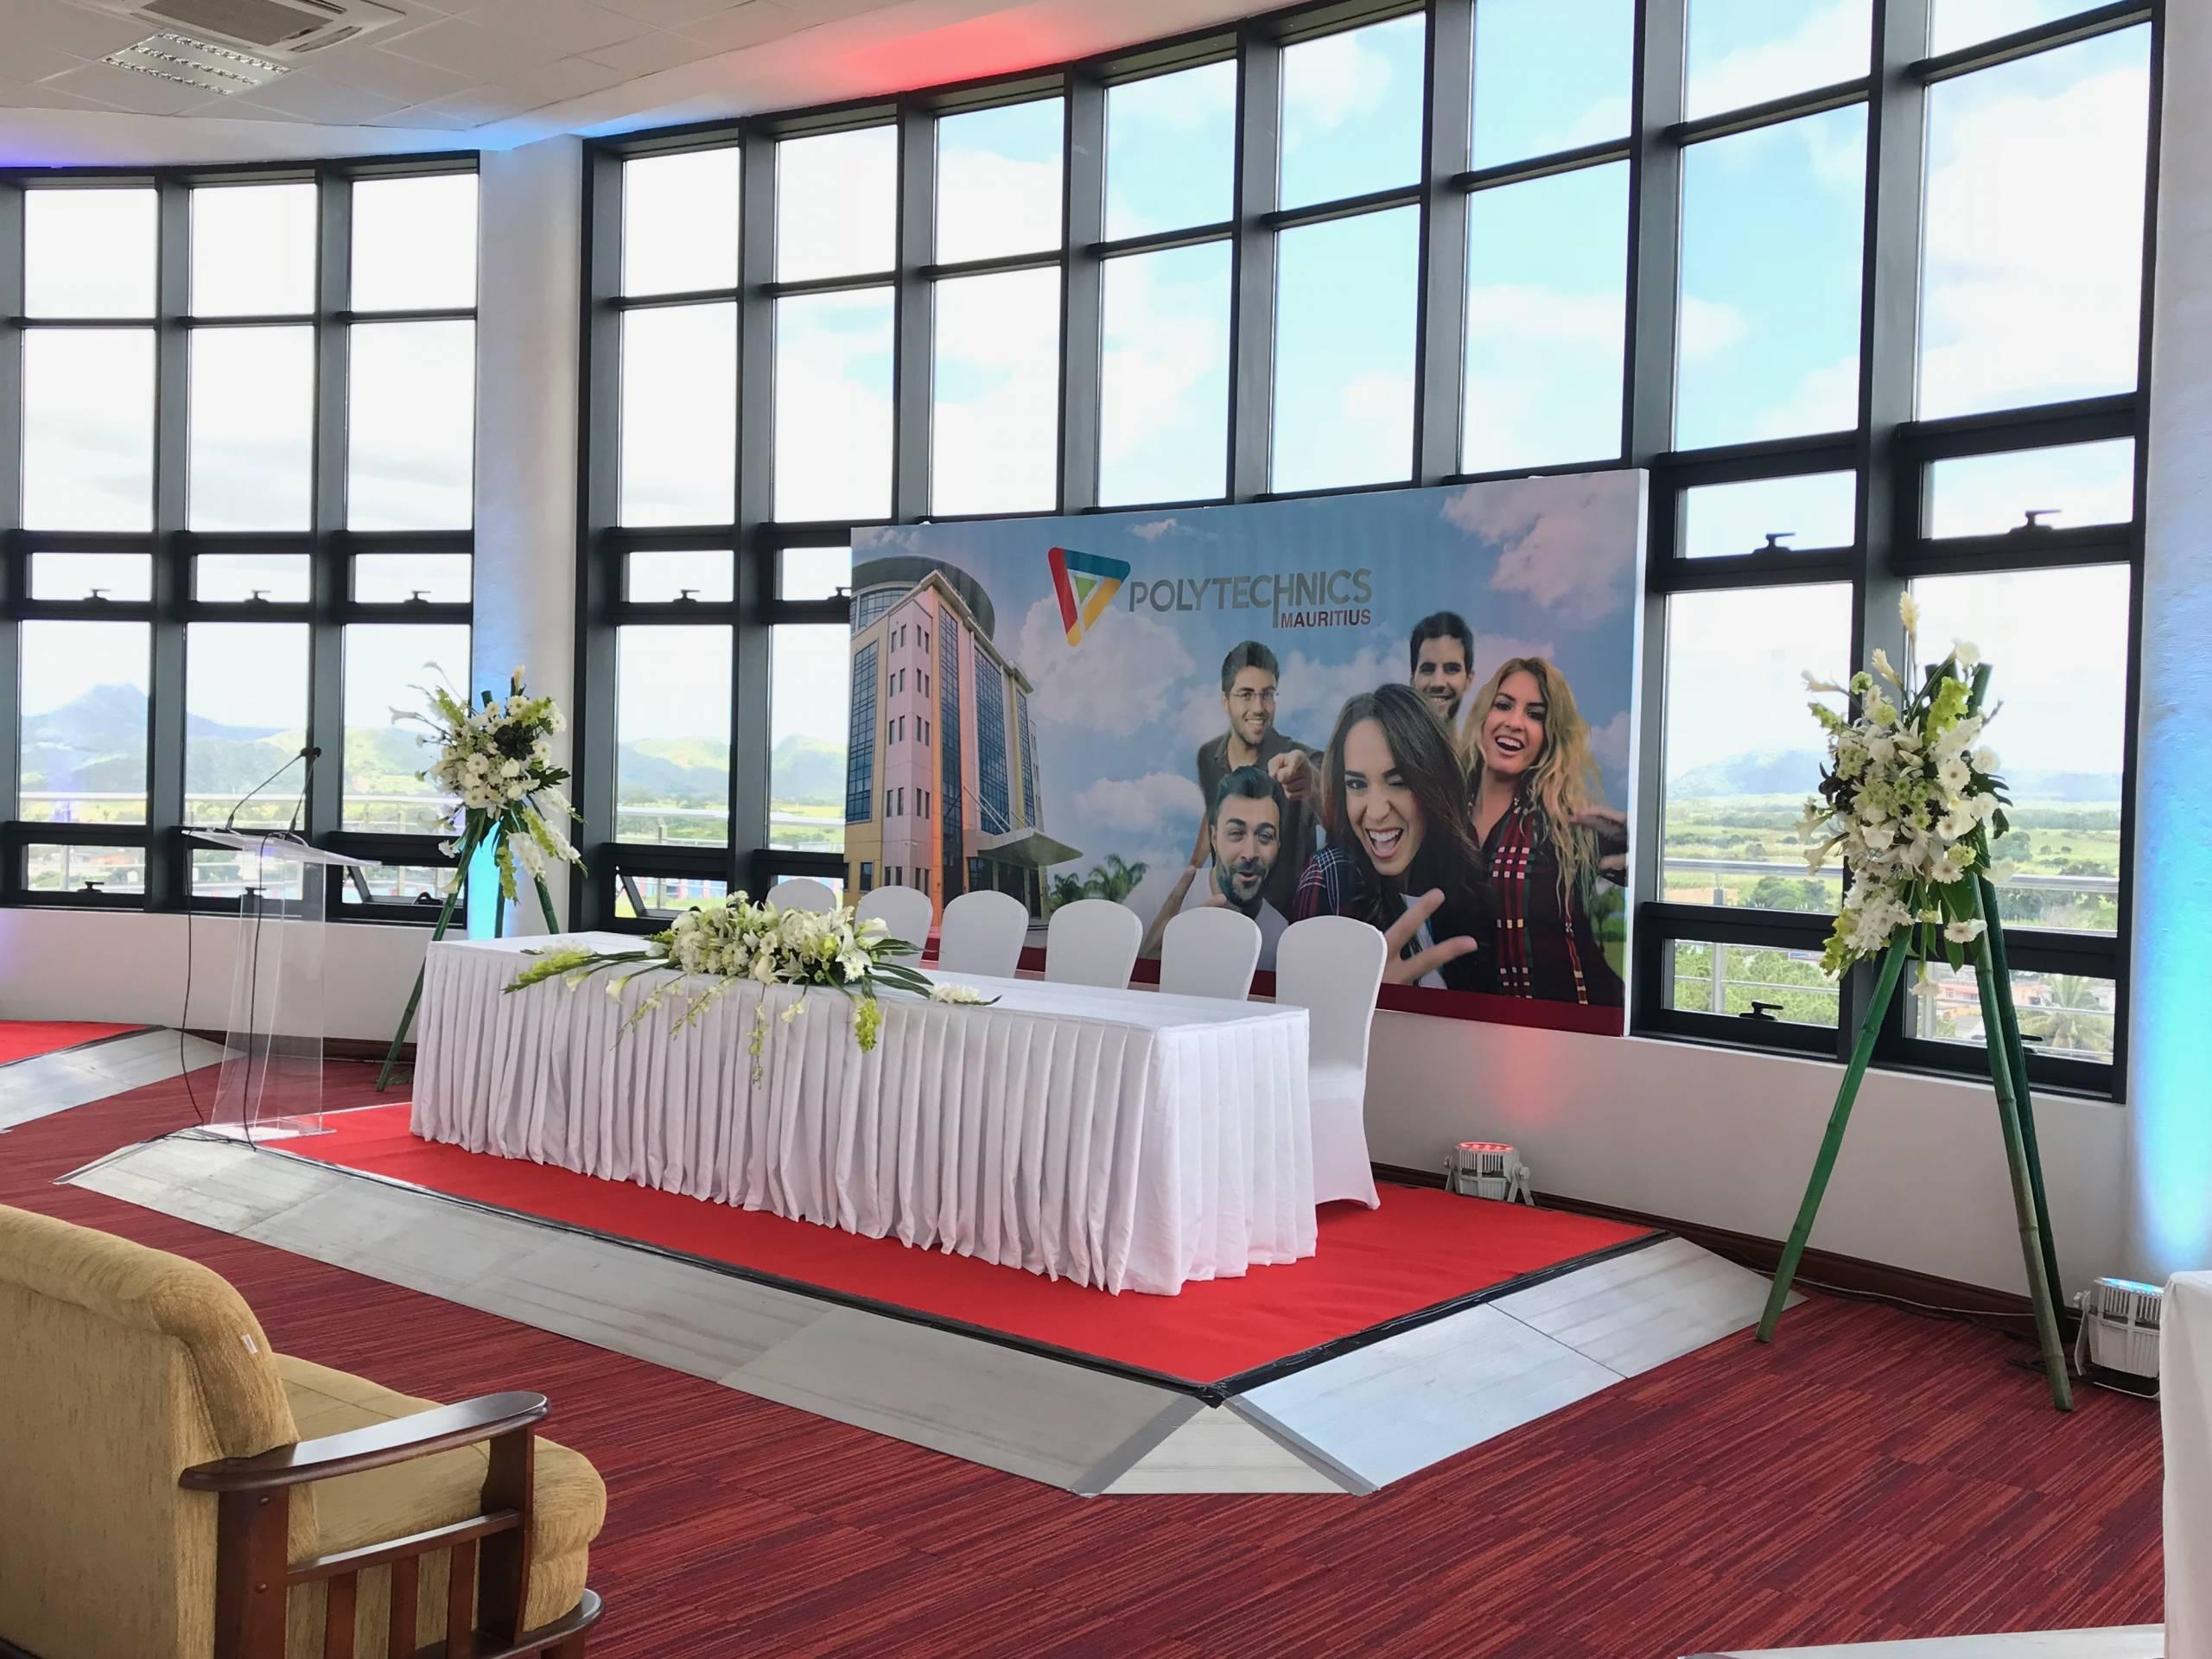 Polytechnics Mauritius event